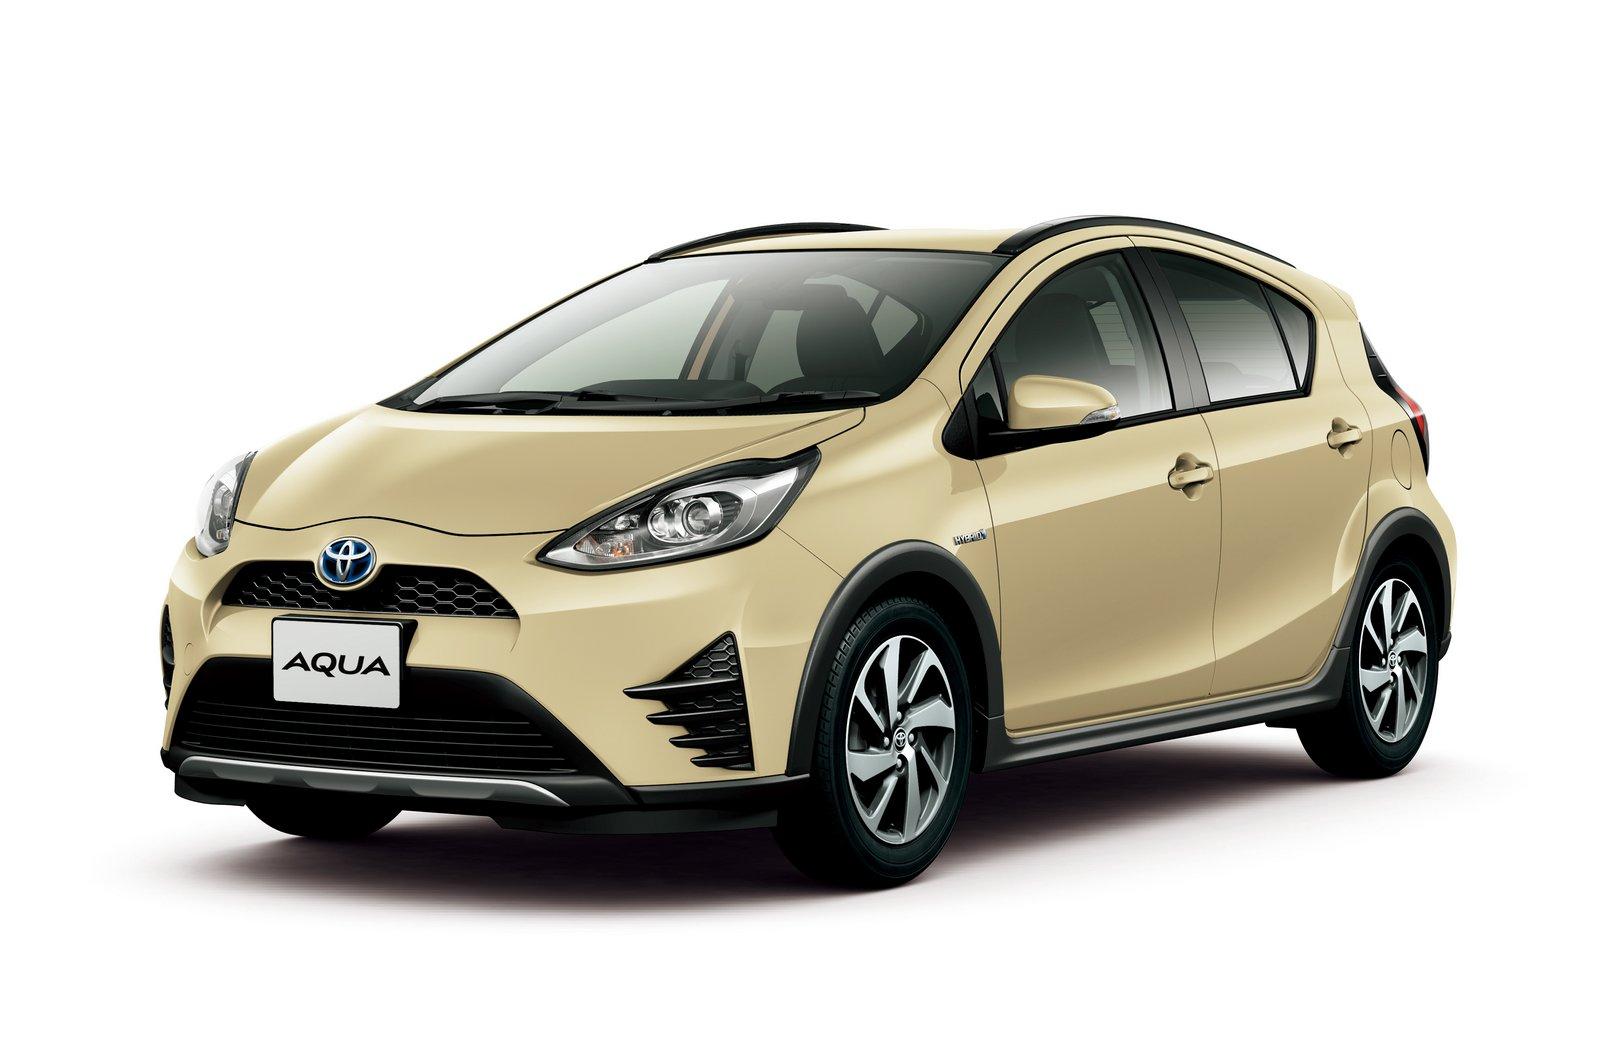 2018_Toyota_Aqua_facelift_01